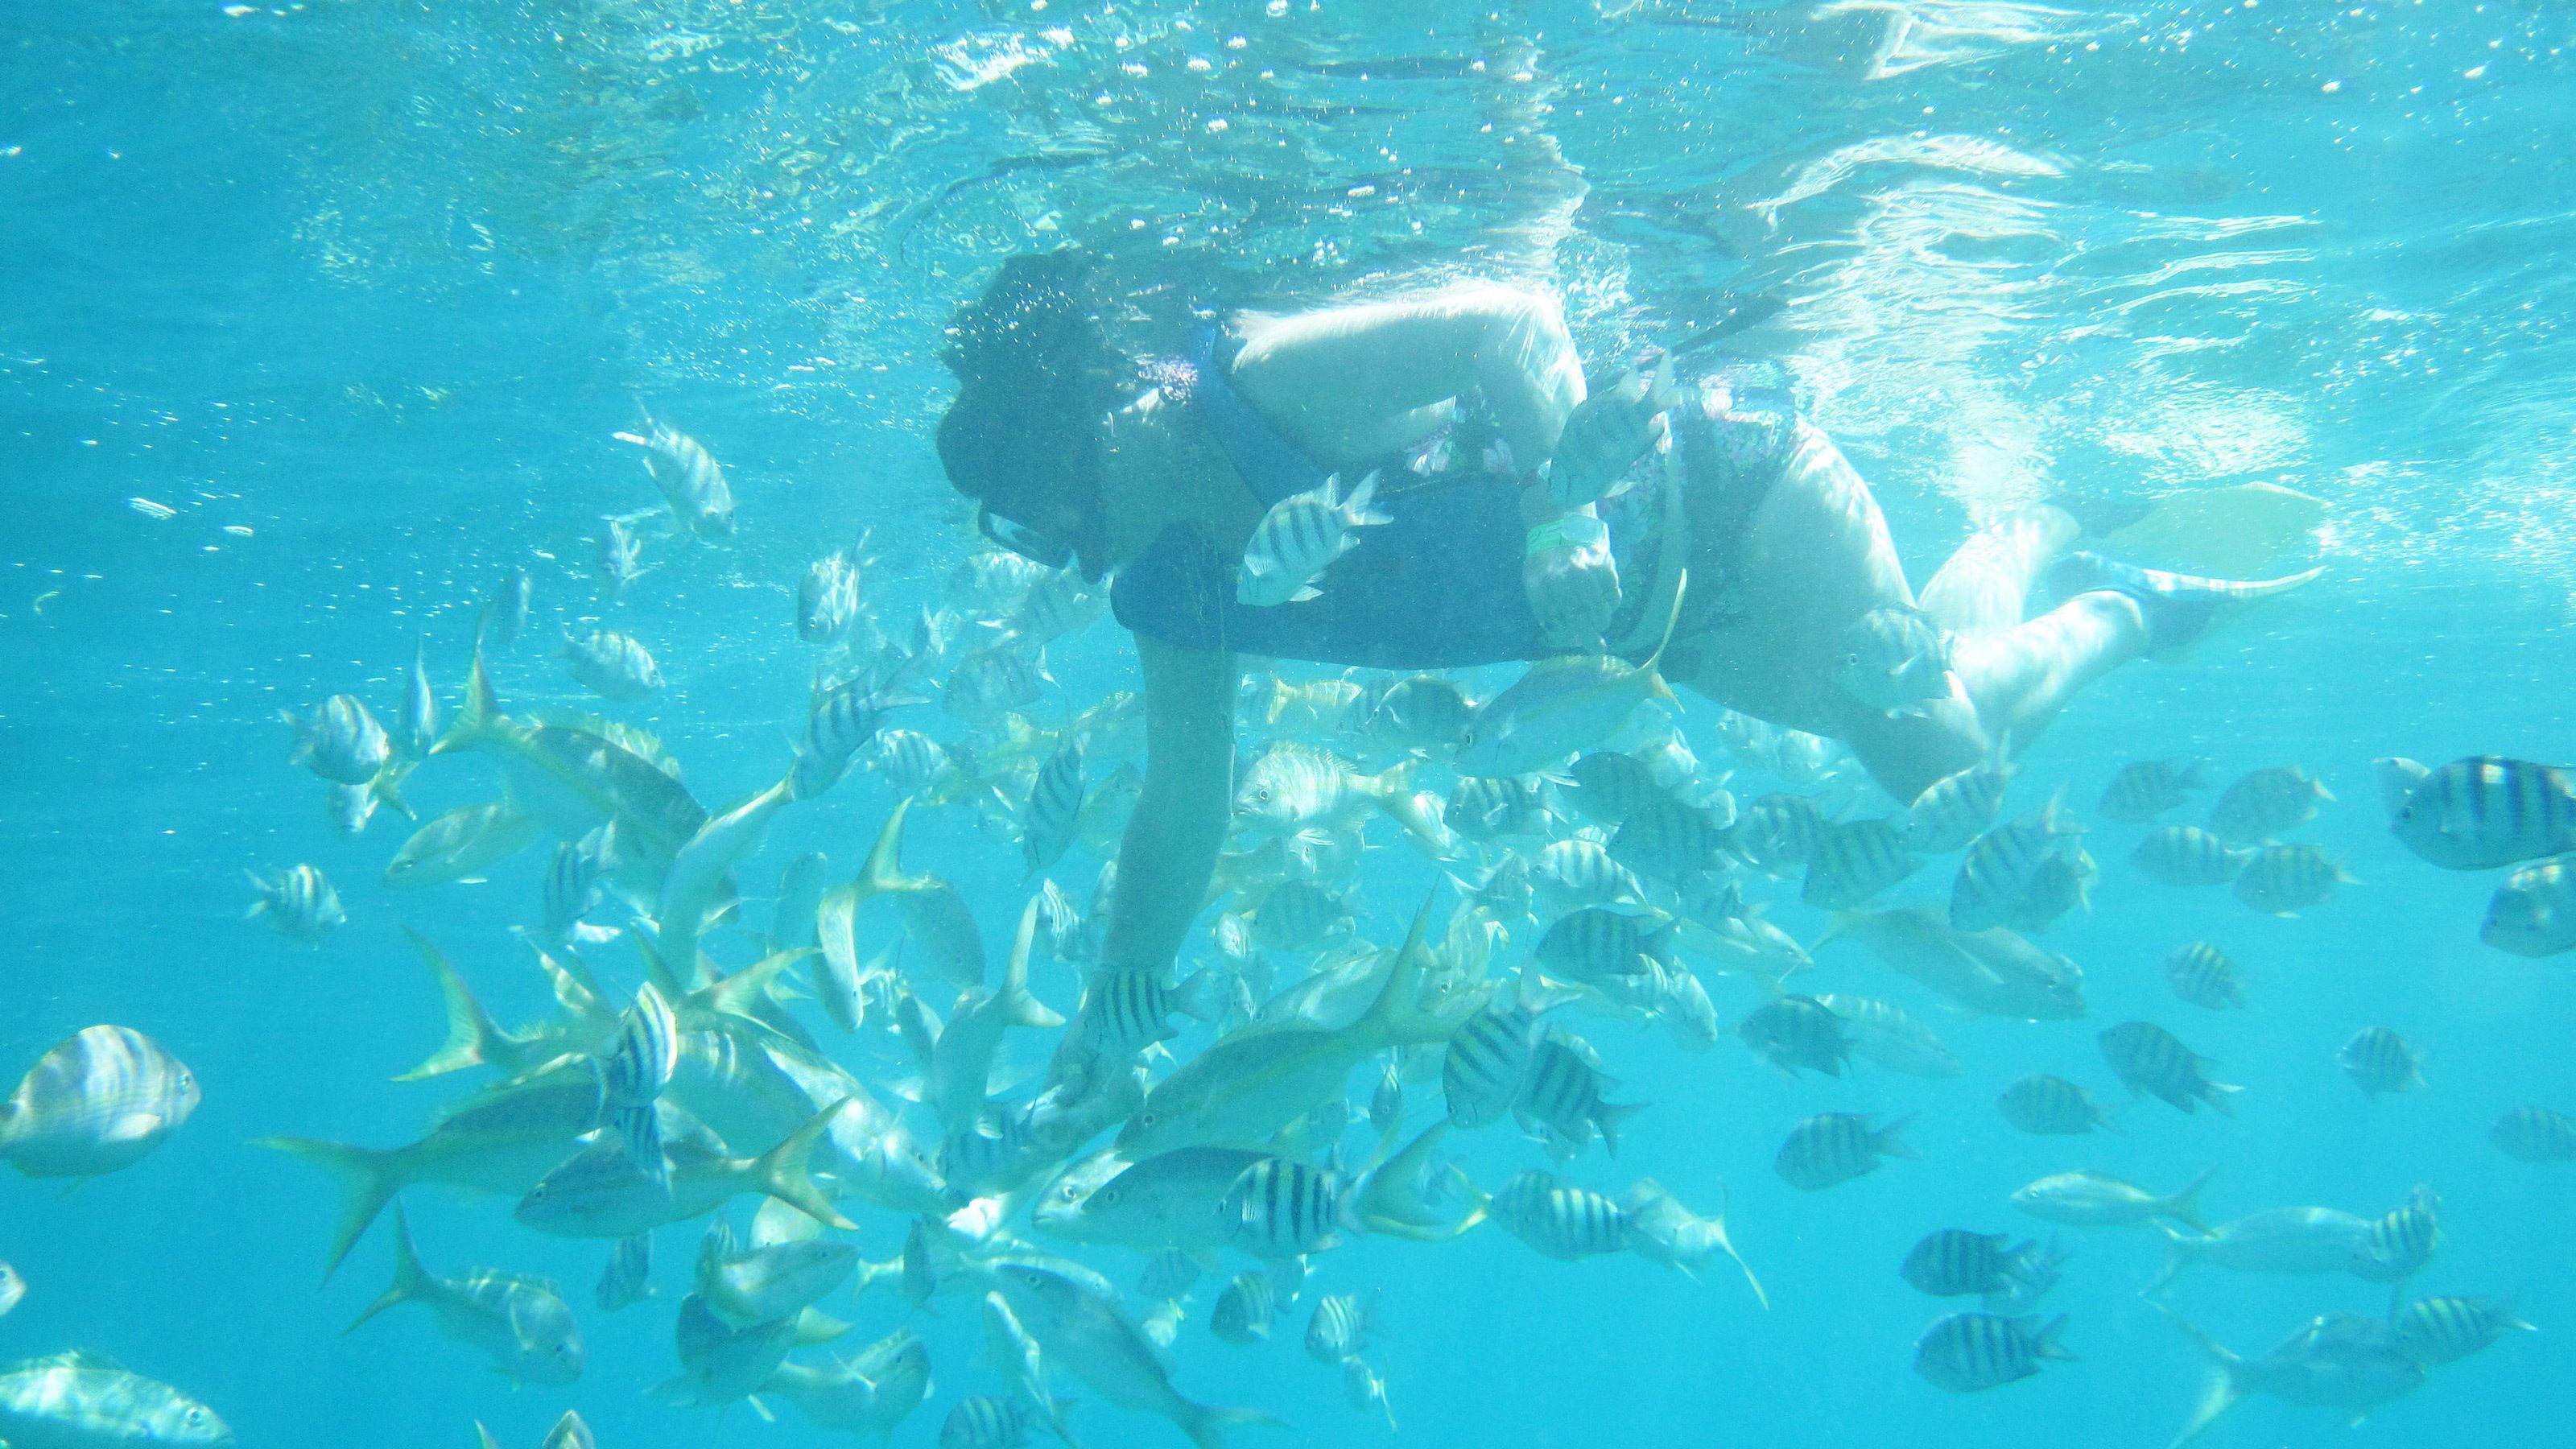 Snorkeling among tropical fish off the coast of Paradise Island